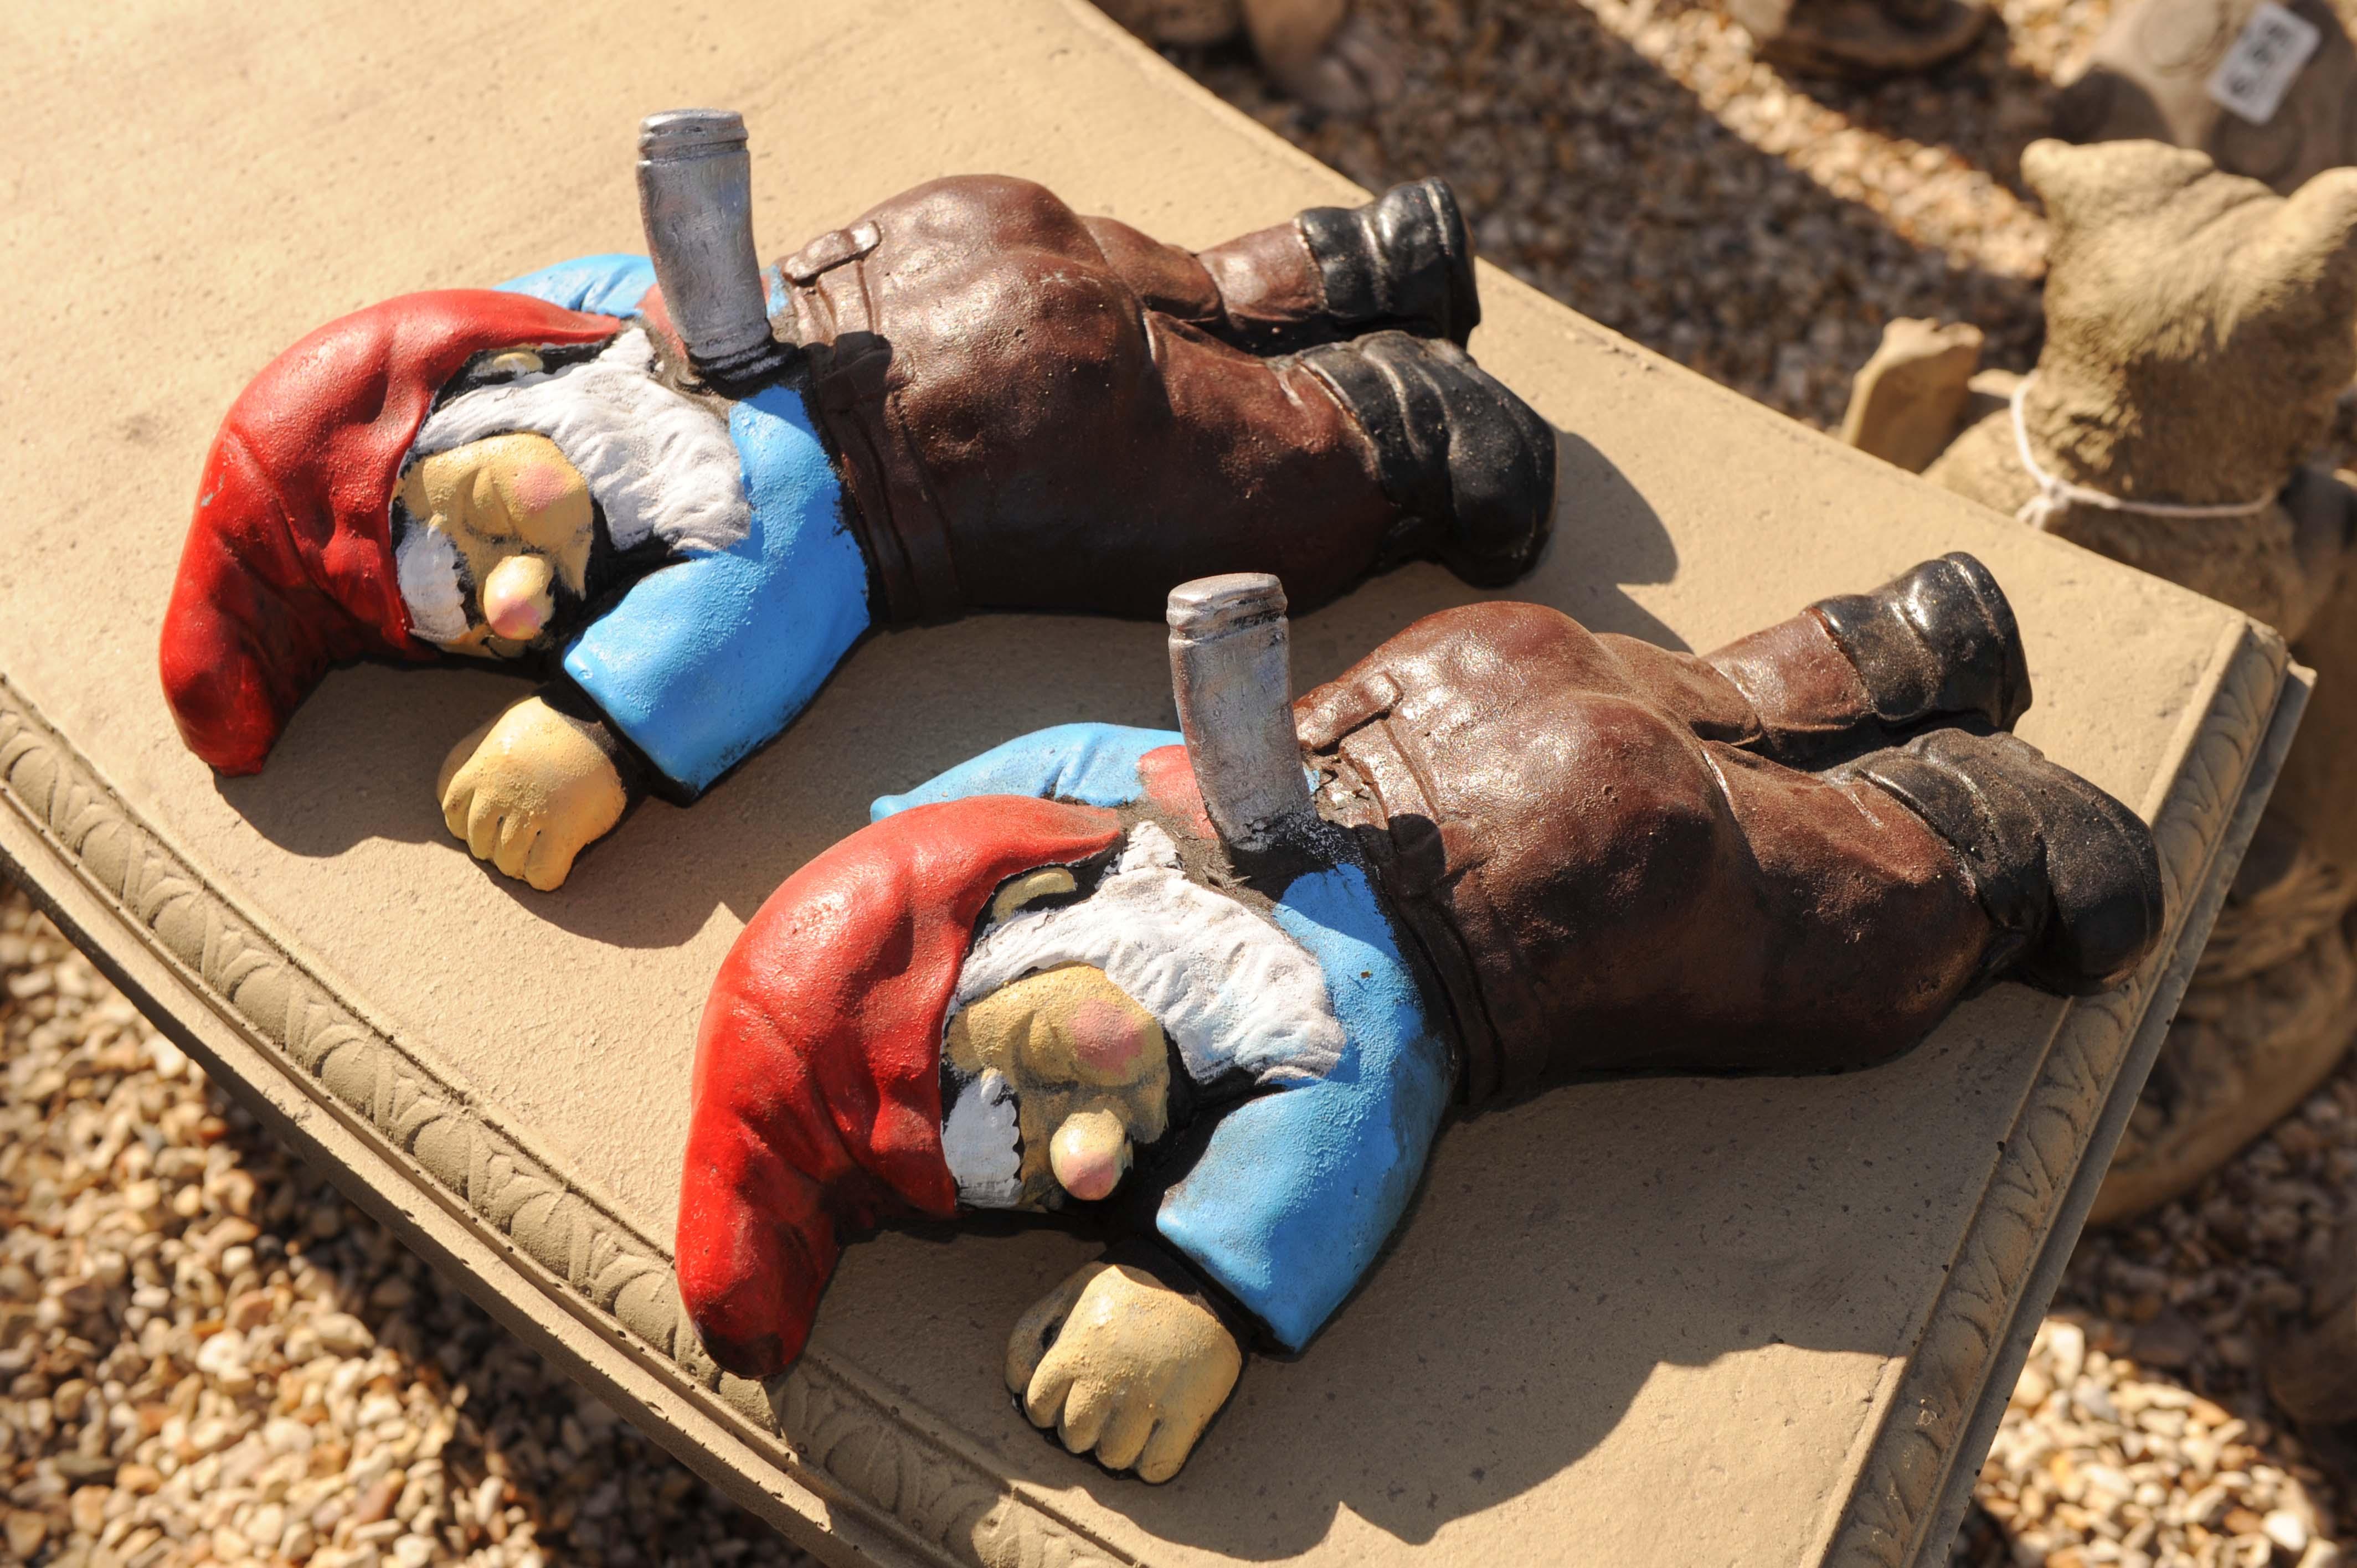 Garden Centre sells controversial stabbed gnome